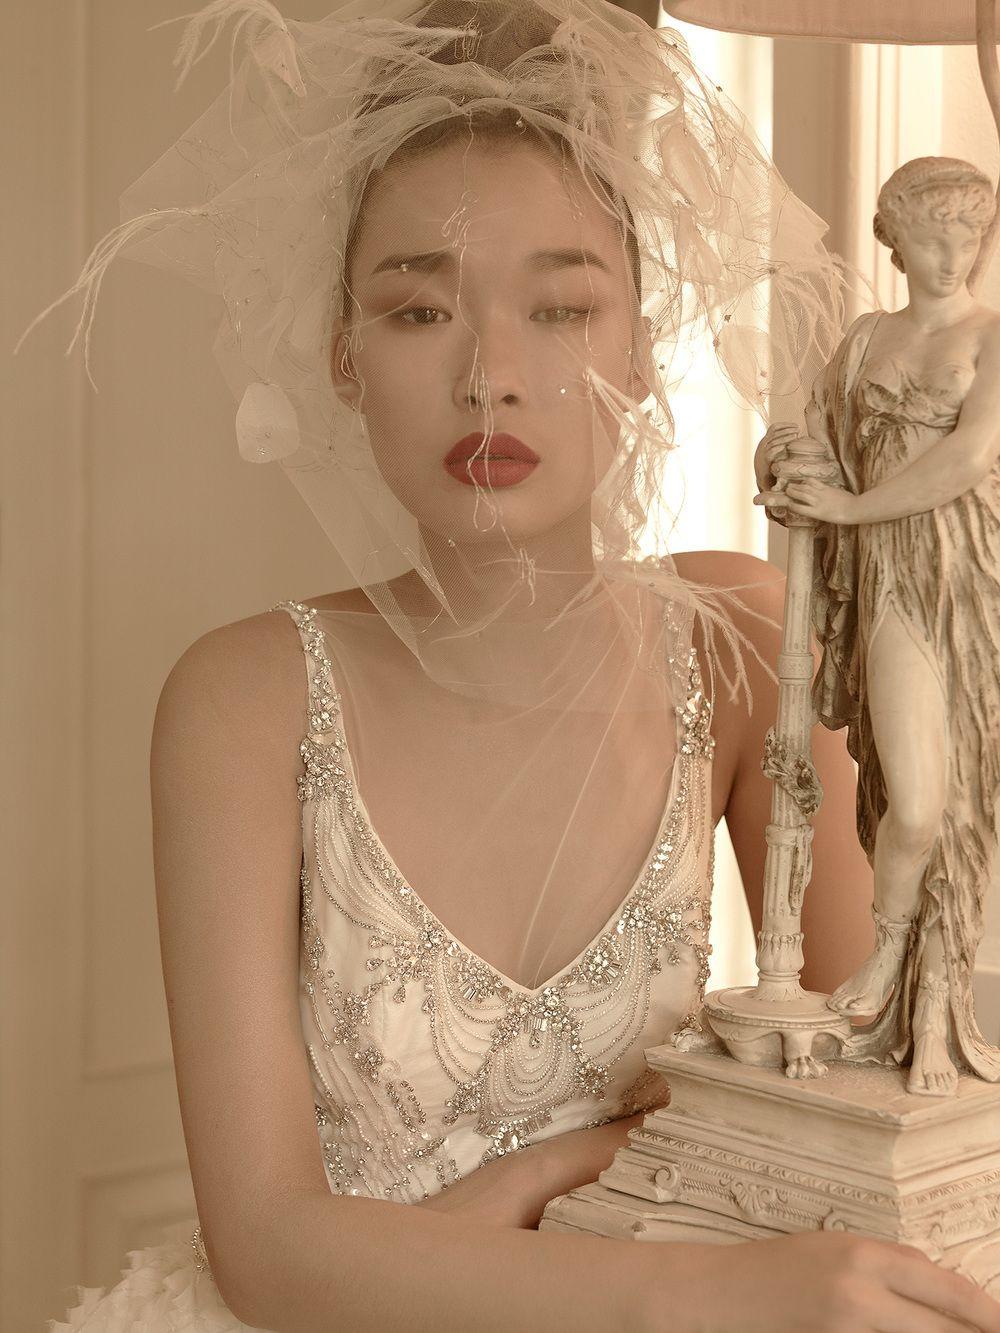 St Pucci | A Colorful Wedding Dress | Pinterest